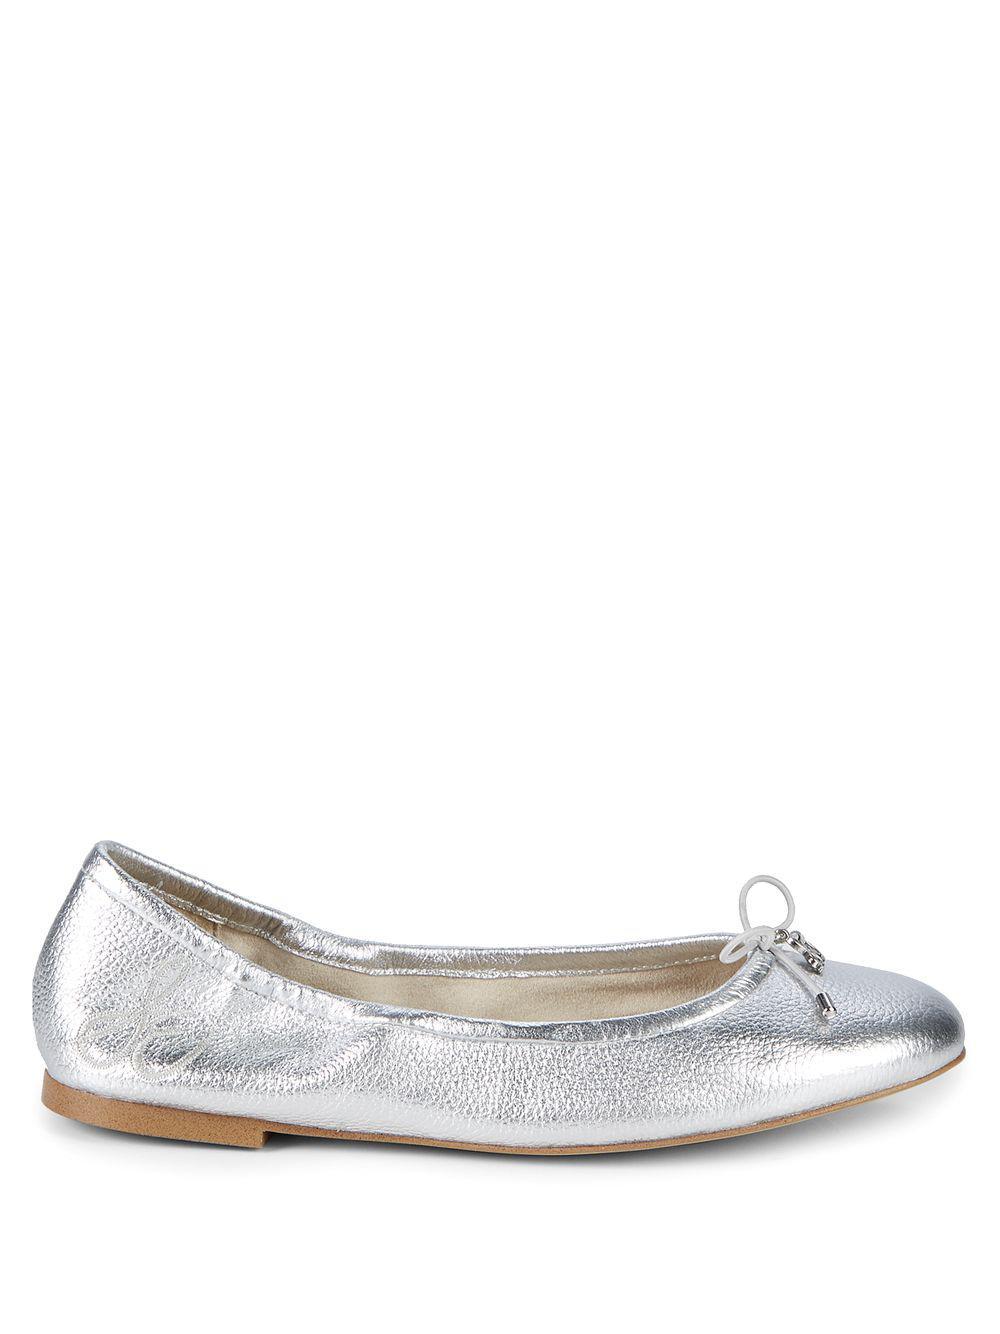 017af2831412a Sam Edelman Felicia Metallic Leather Ballet Flats in Metallic - Lyst